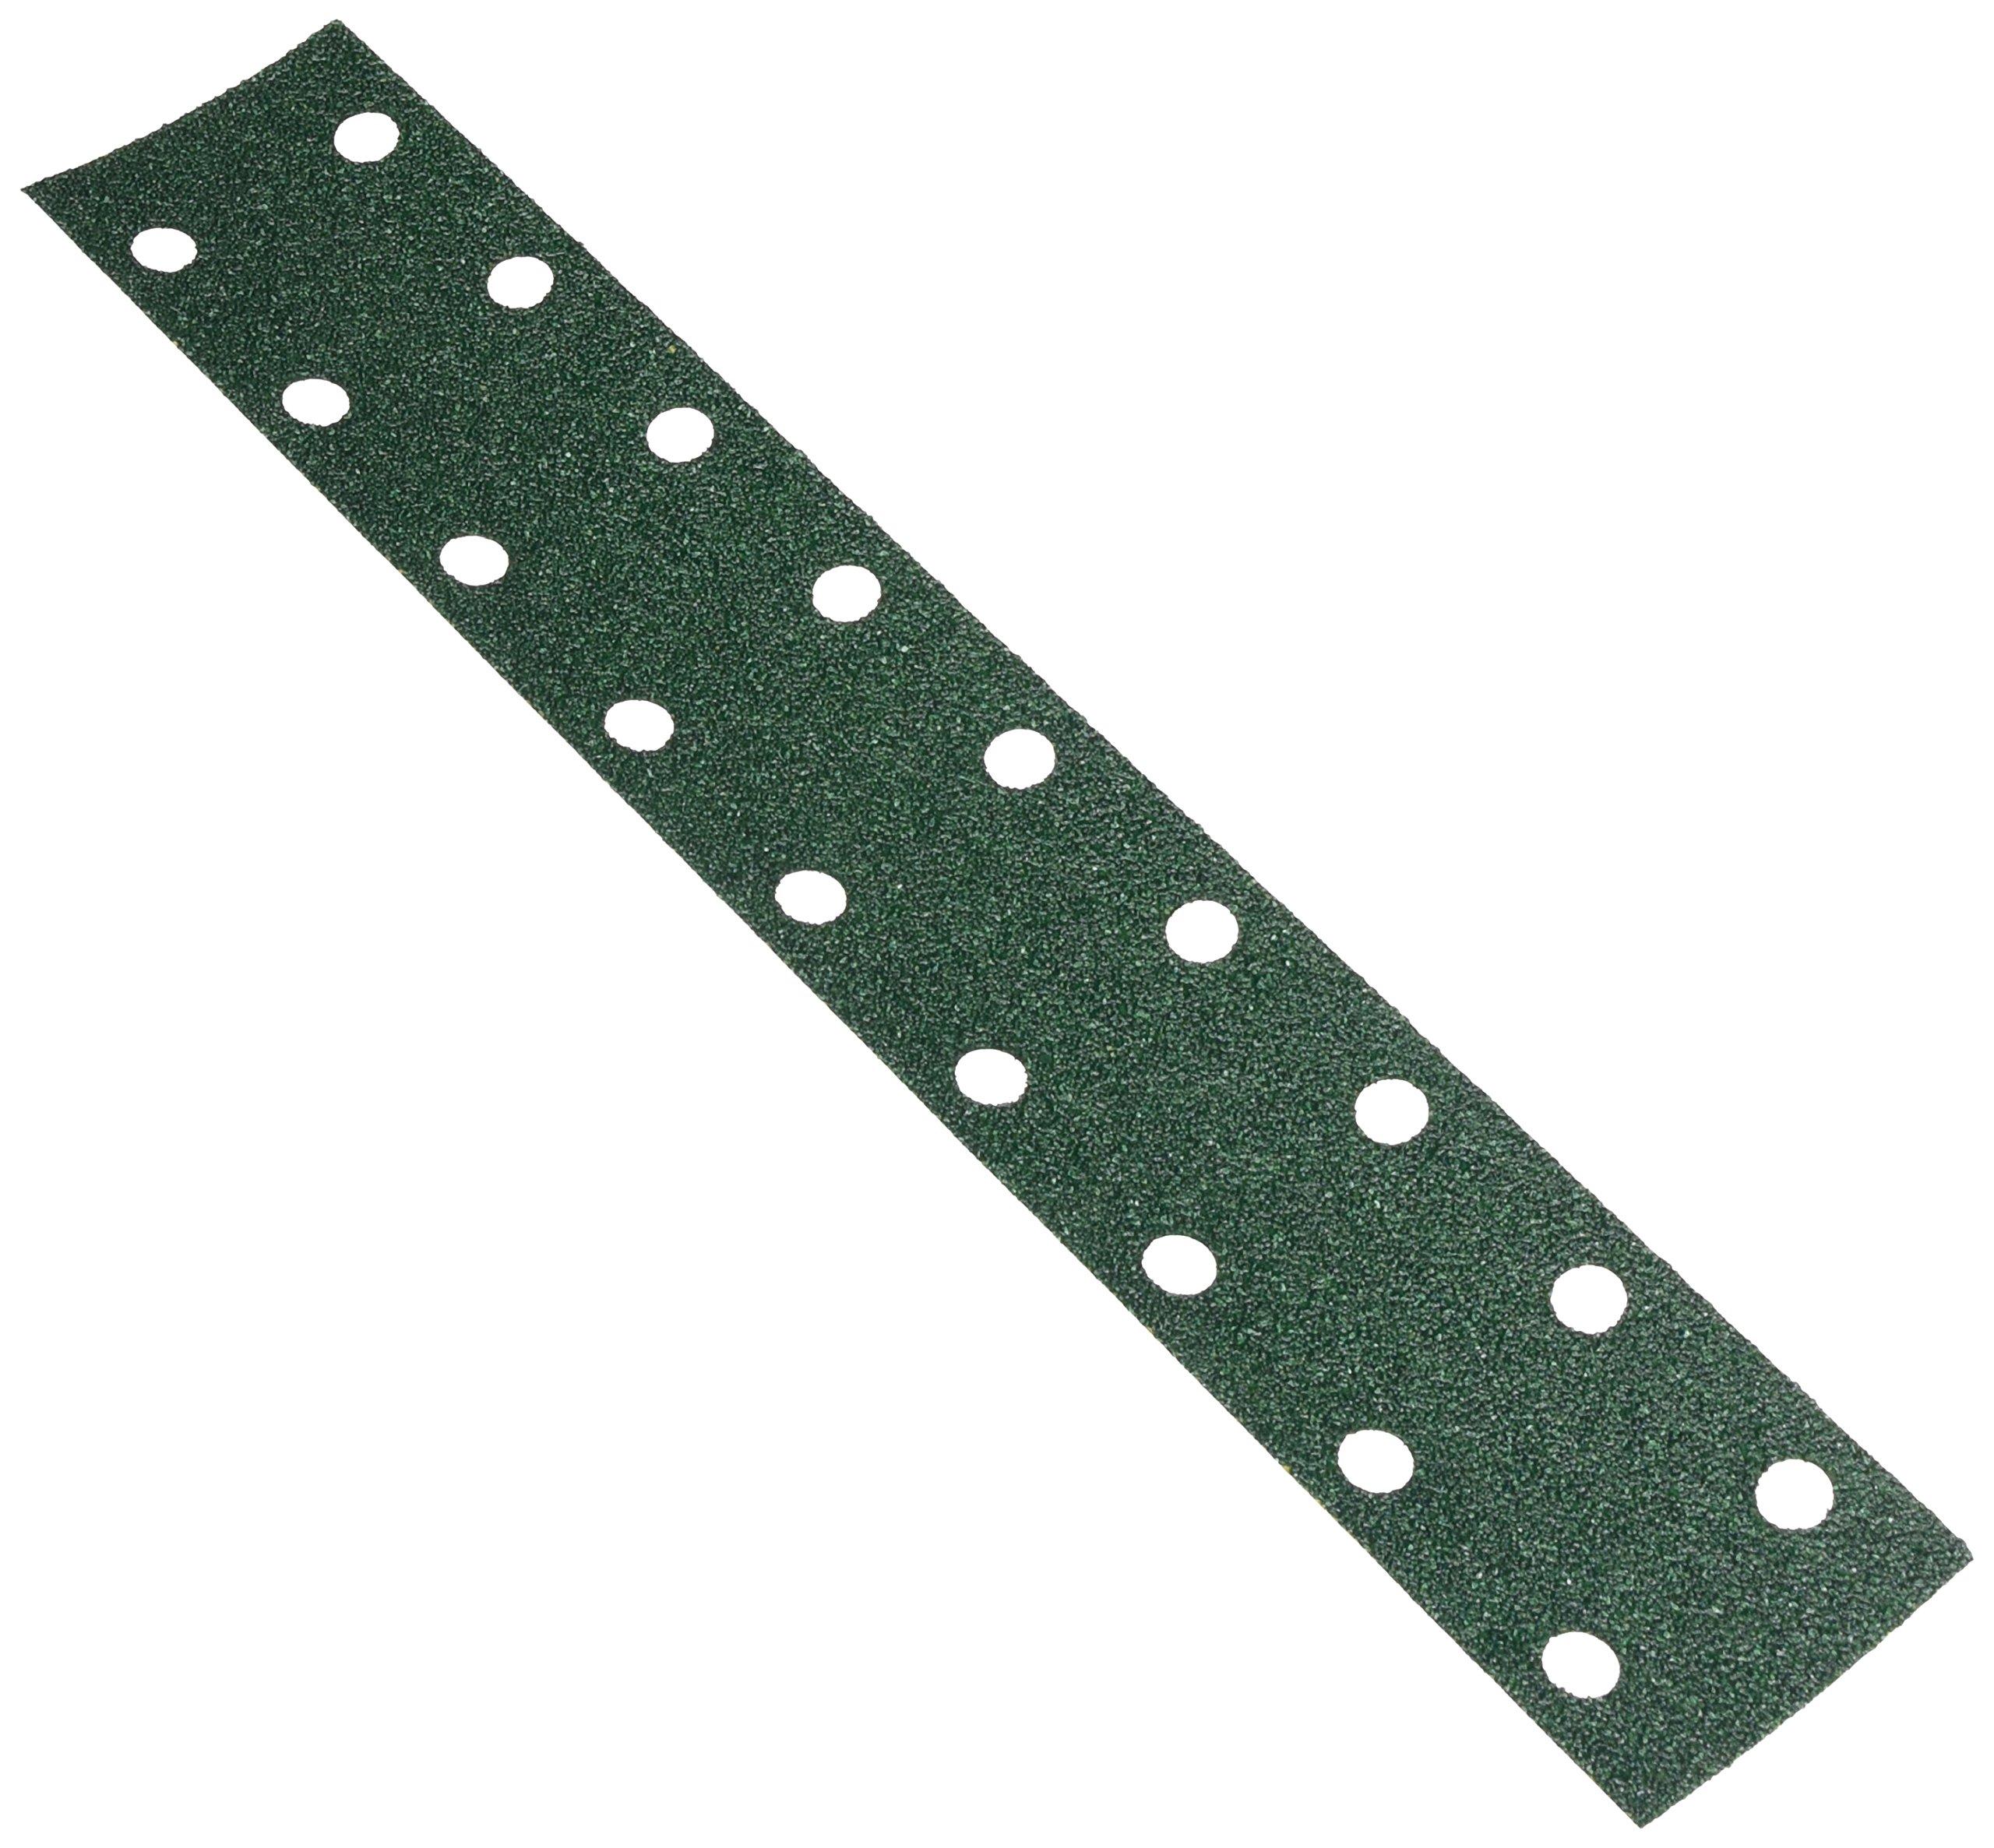 3M 00642 Green Corps Hookit 2-3/4'' x 16'' 40E Grit Regalite Dust-Free Sheet